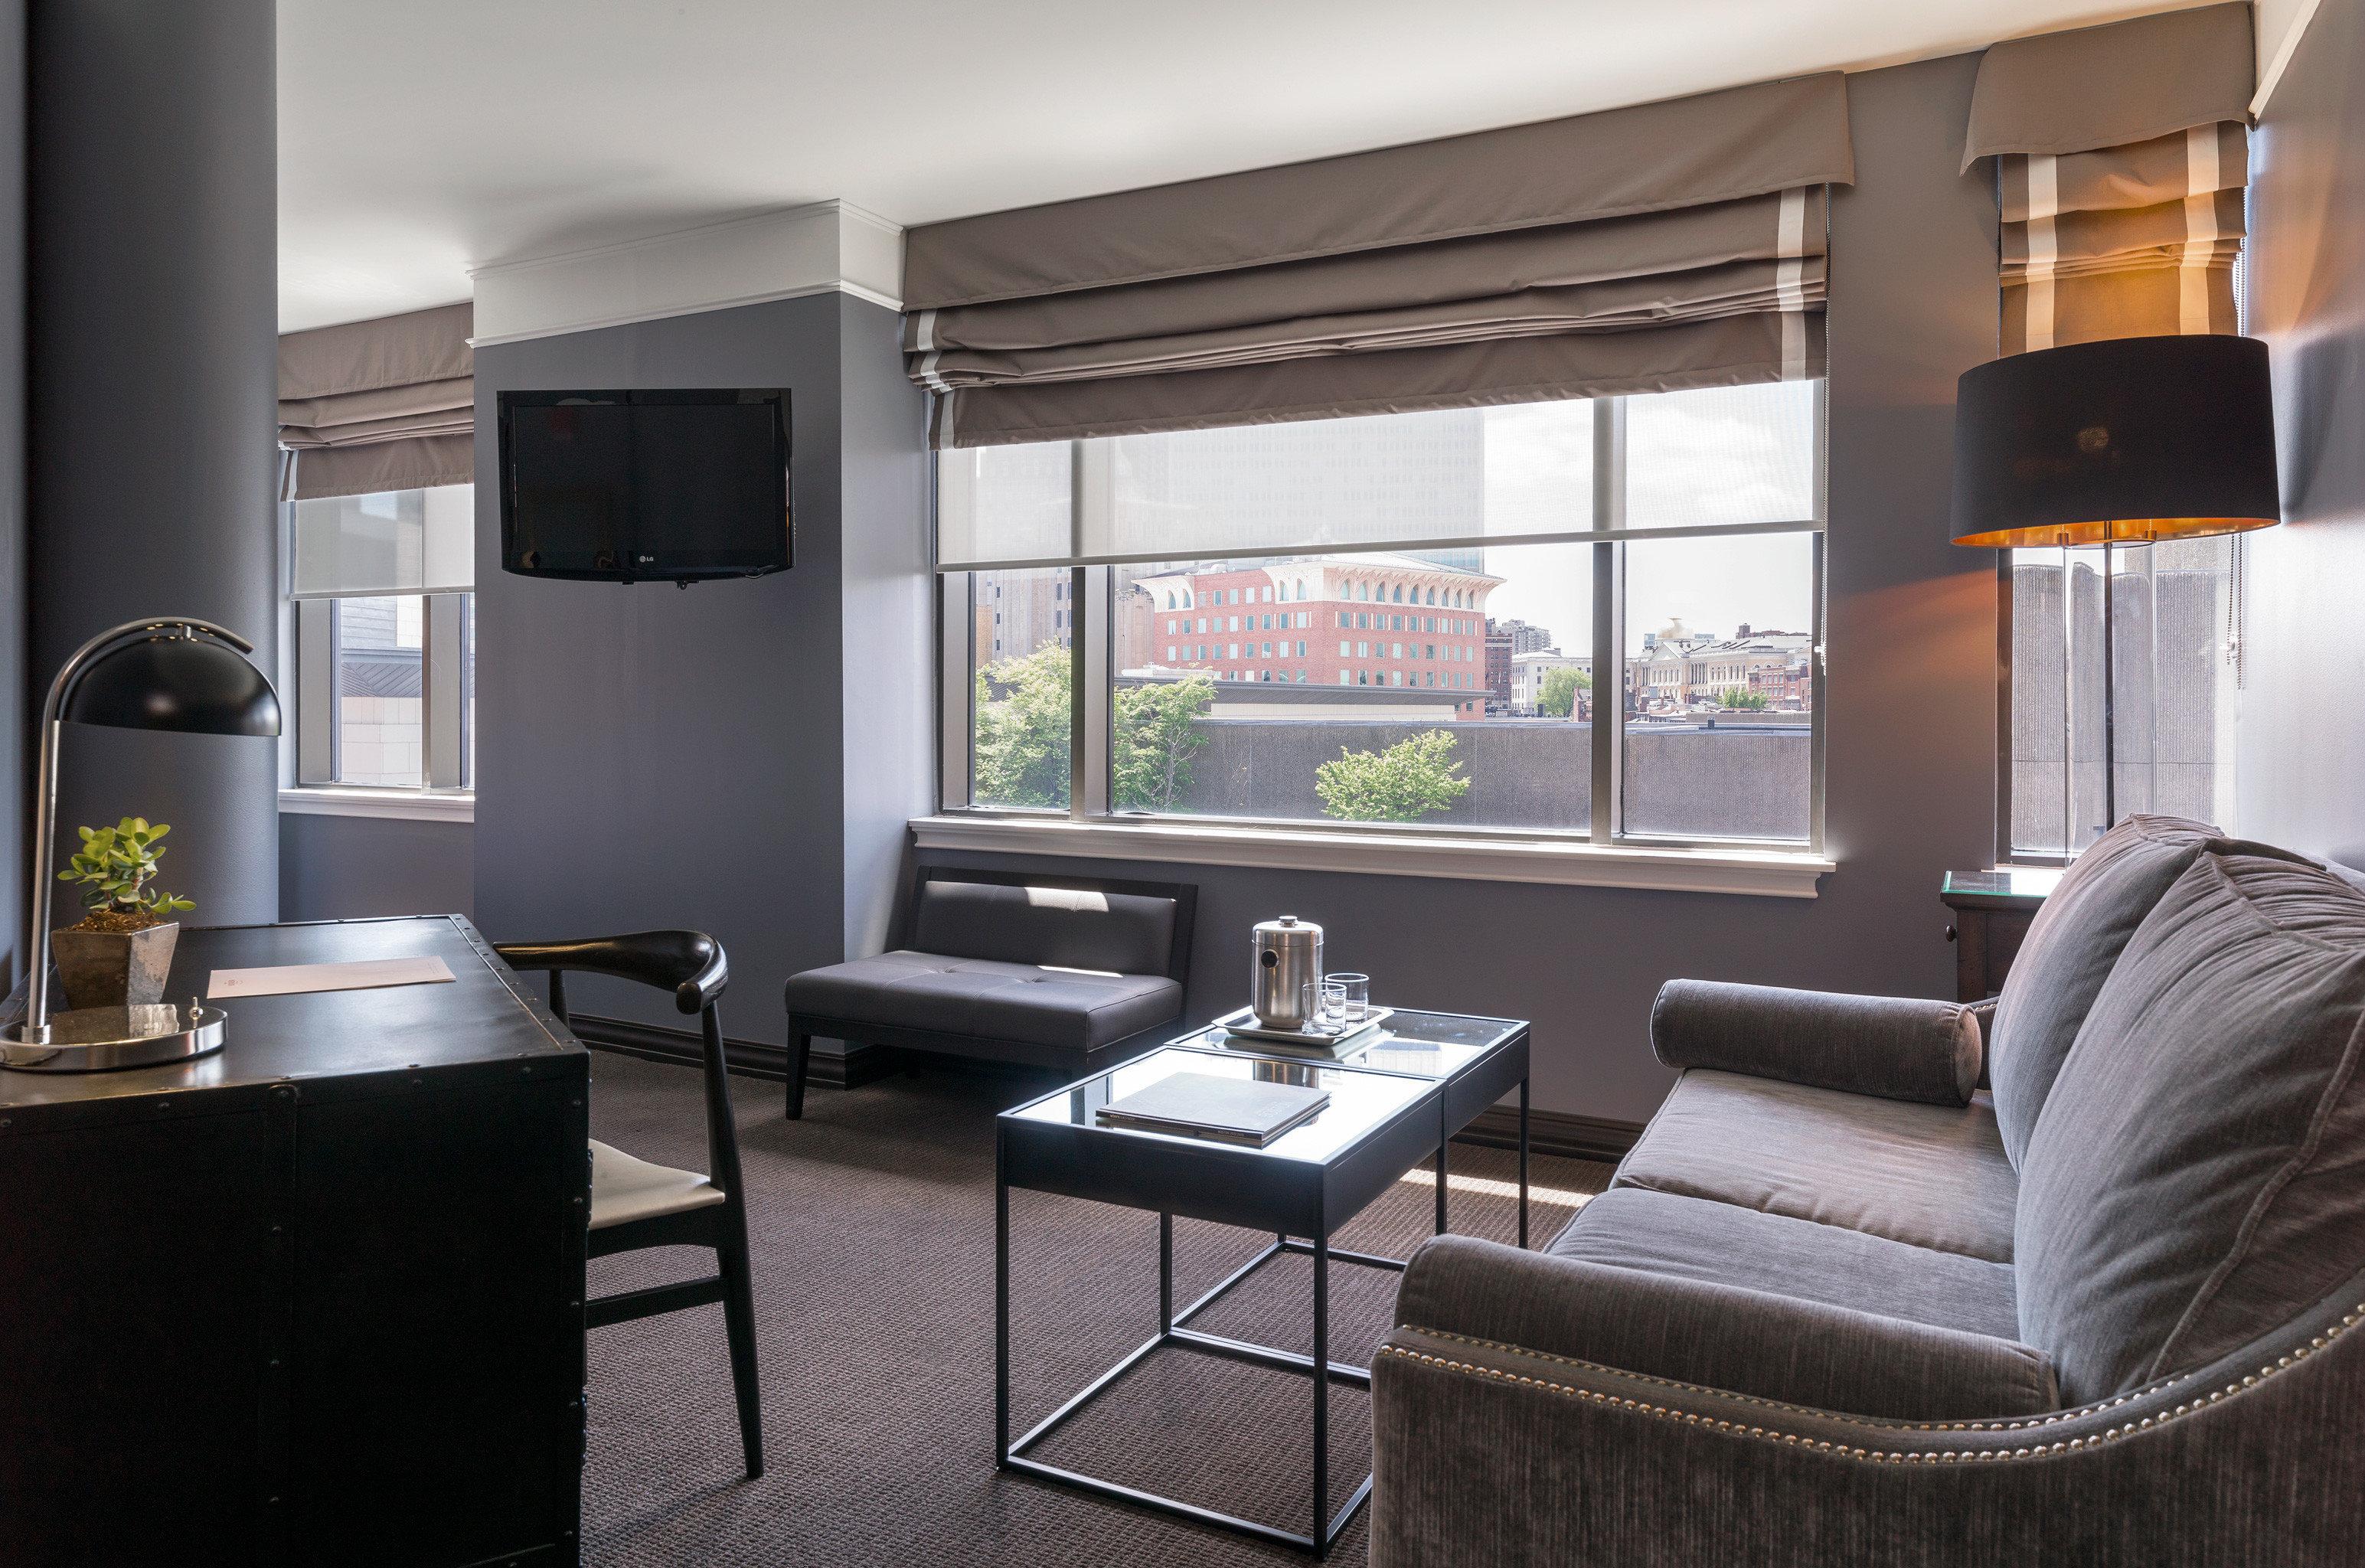 Bedroom Boutique City Classic Lounge Suite living room property condominium home